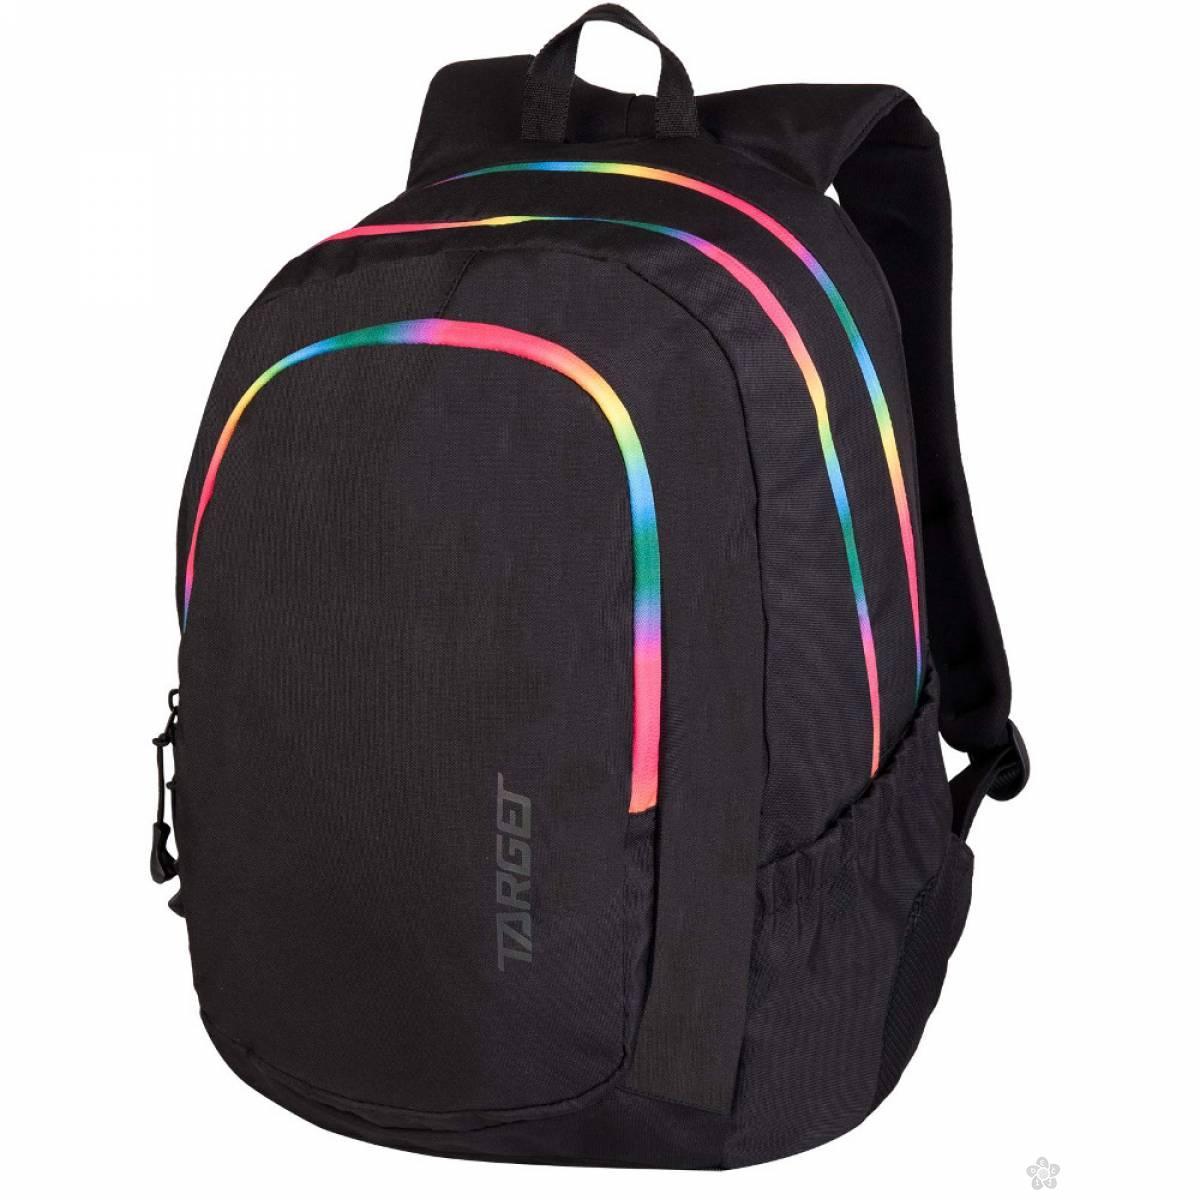 Ranac 3zip Duel Black Rainbow 26642